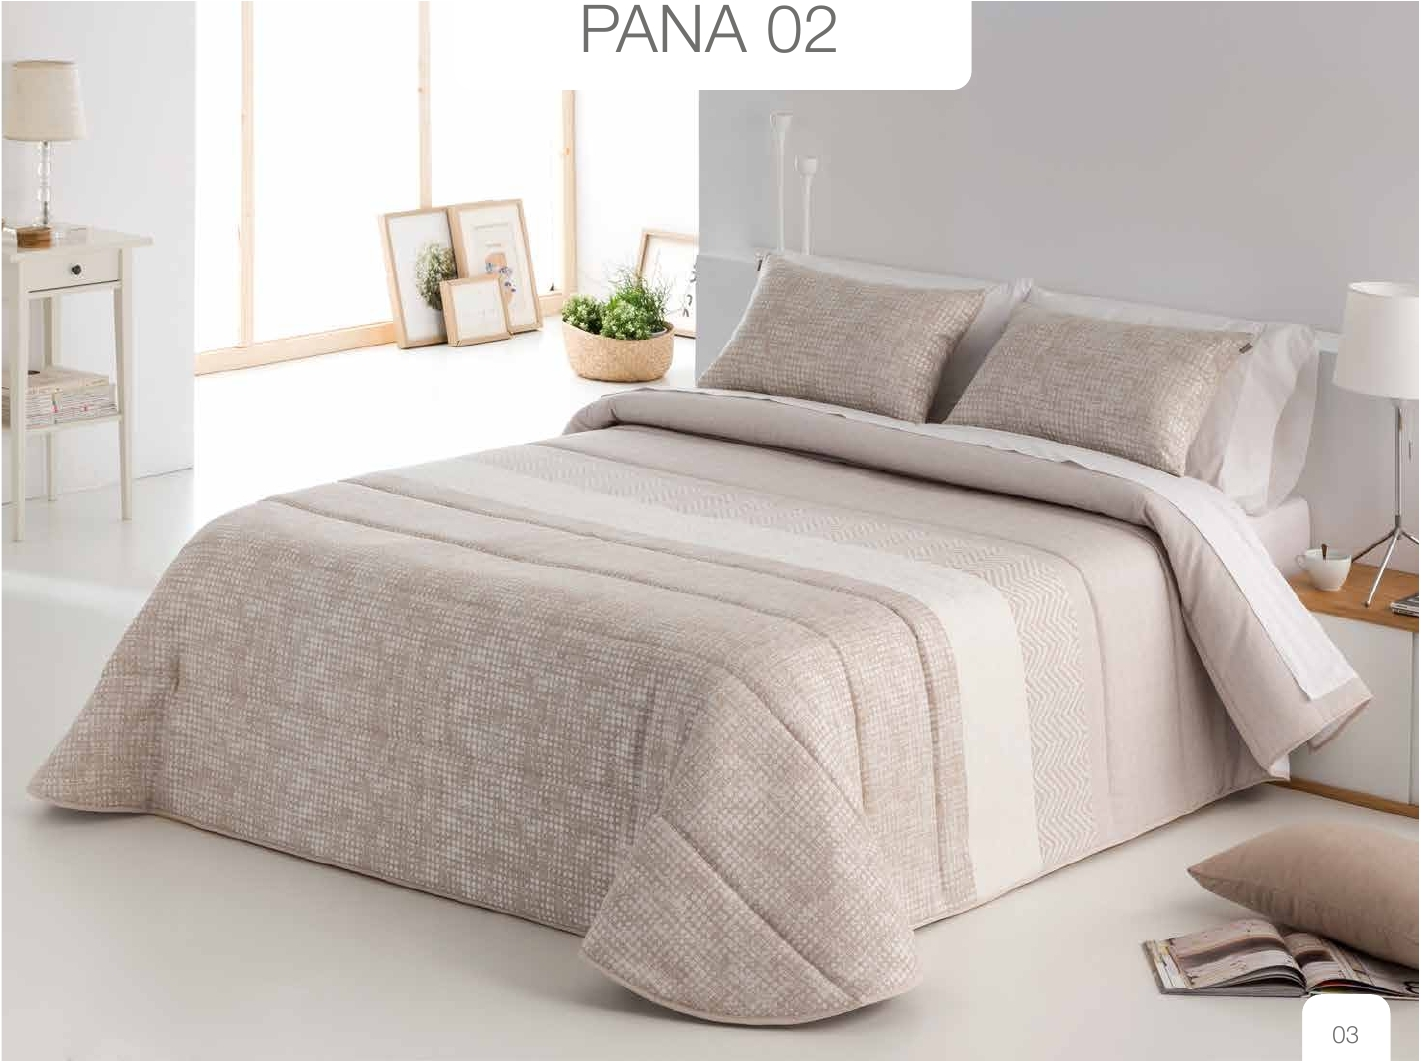 Conforter Bouti Jacquard Pana Beige